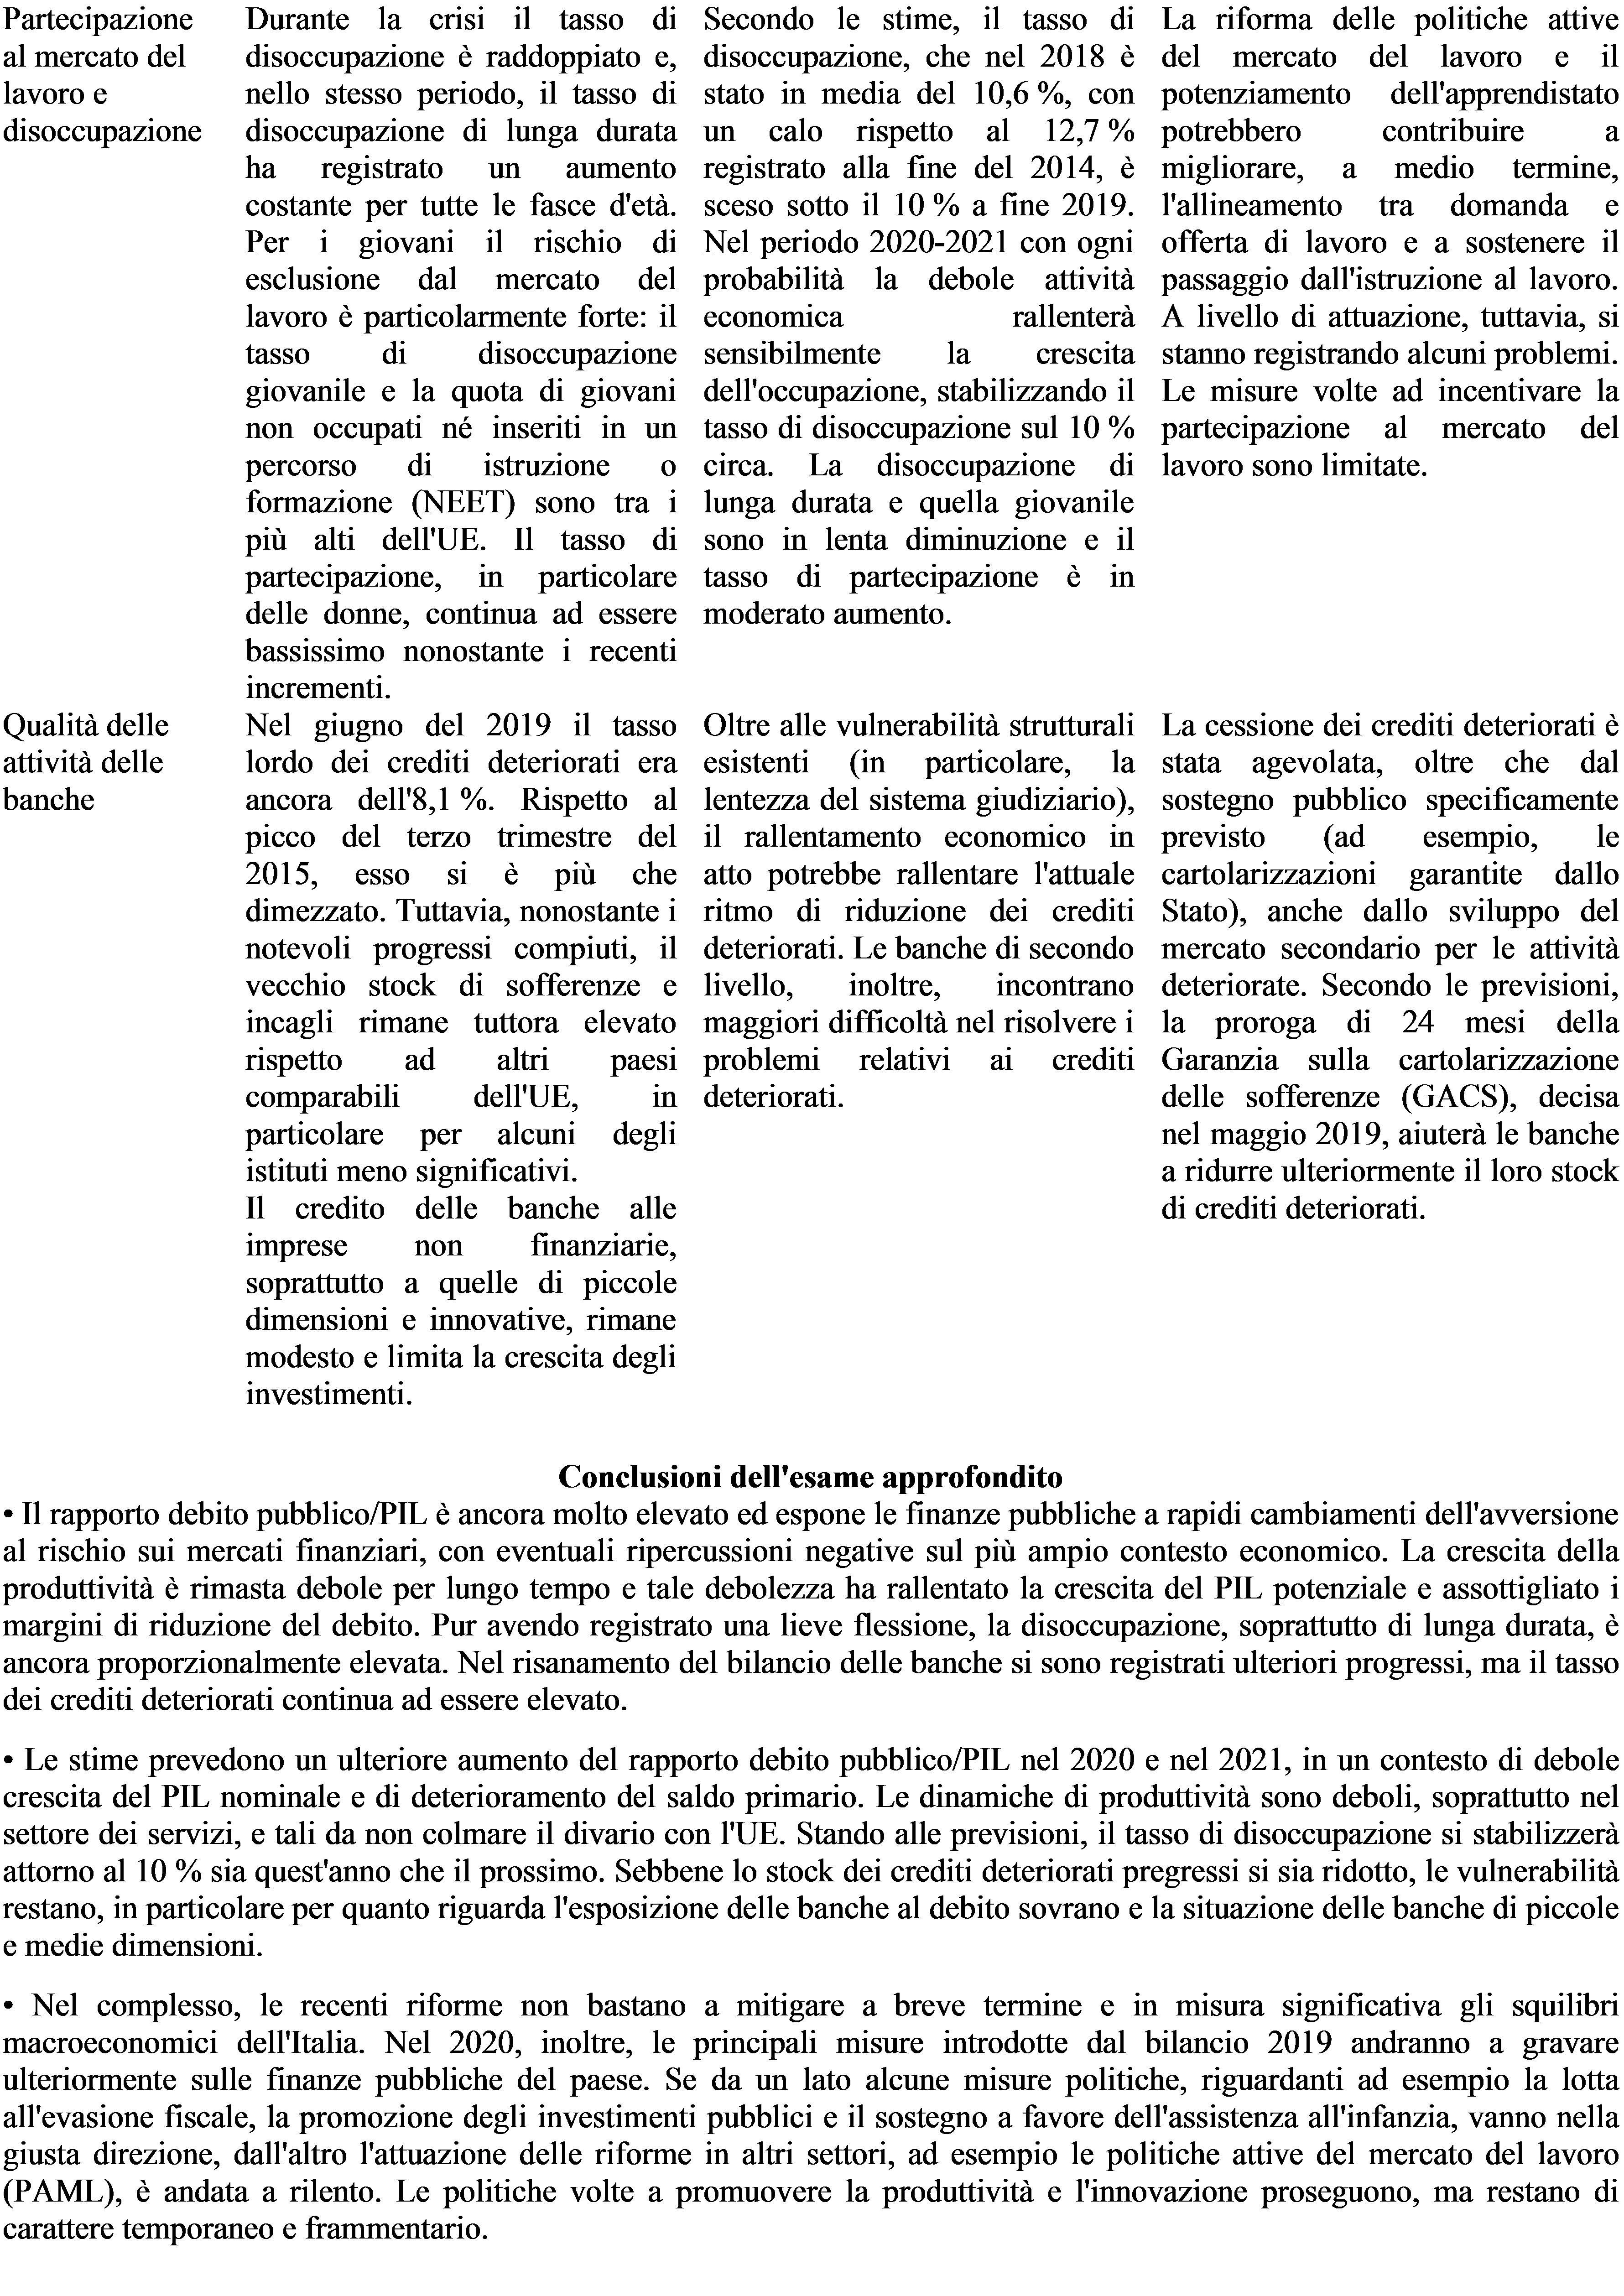 Immc Swd 282020 29511 20final Ita Xhtml 29 It Autre Document Travail Service Part1 V2 Docx